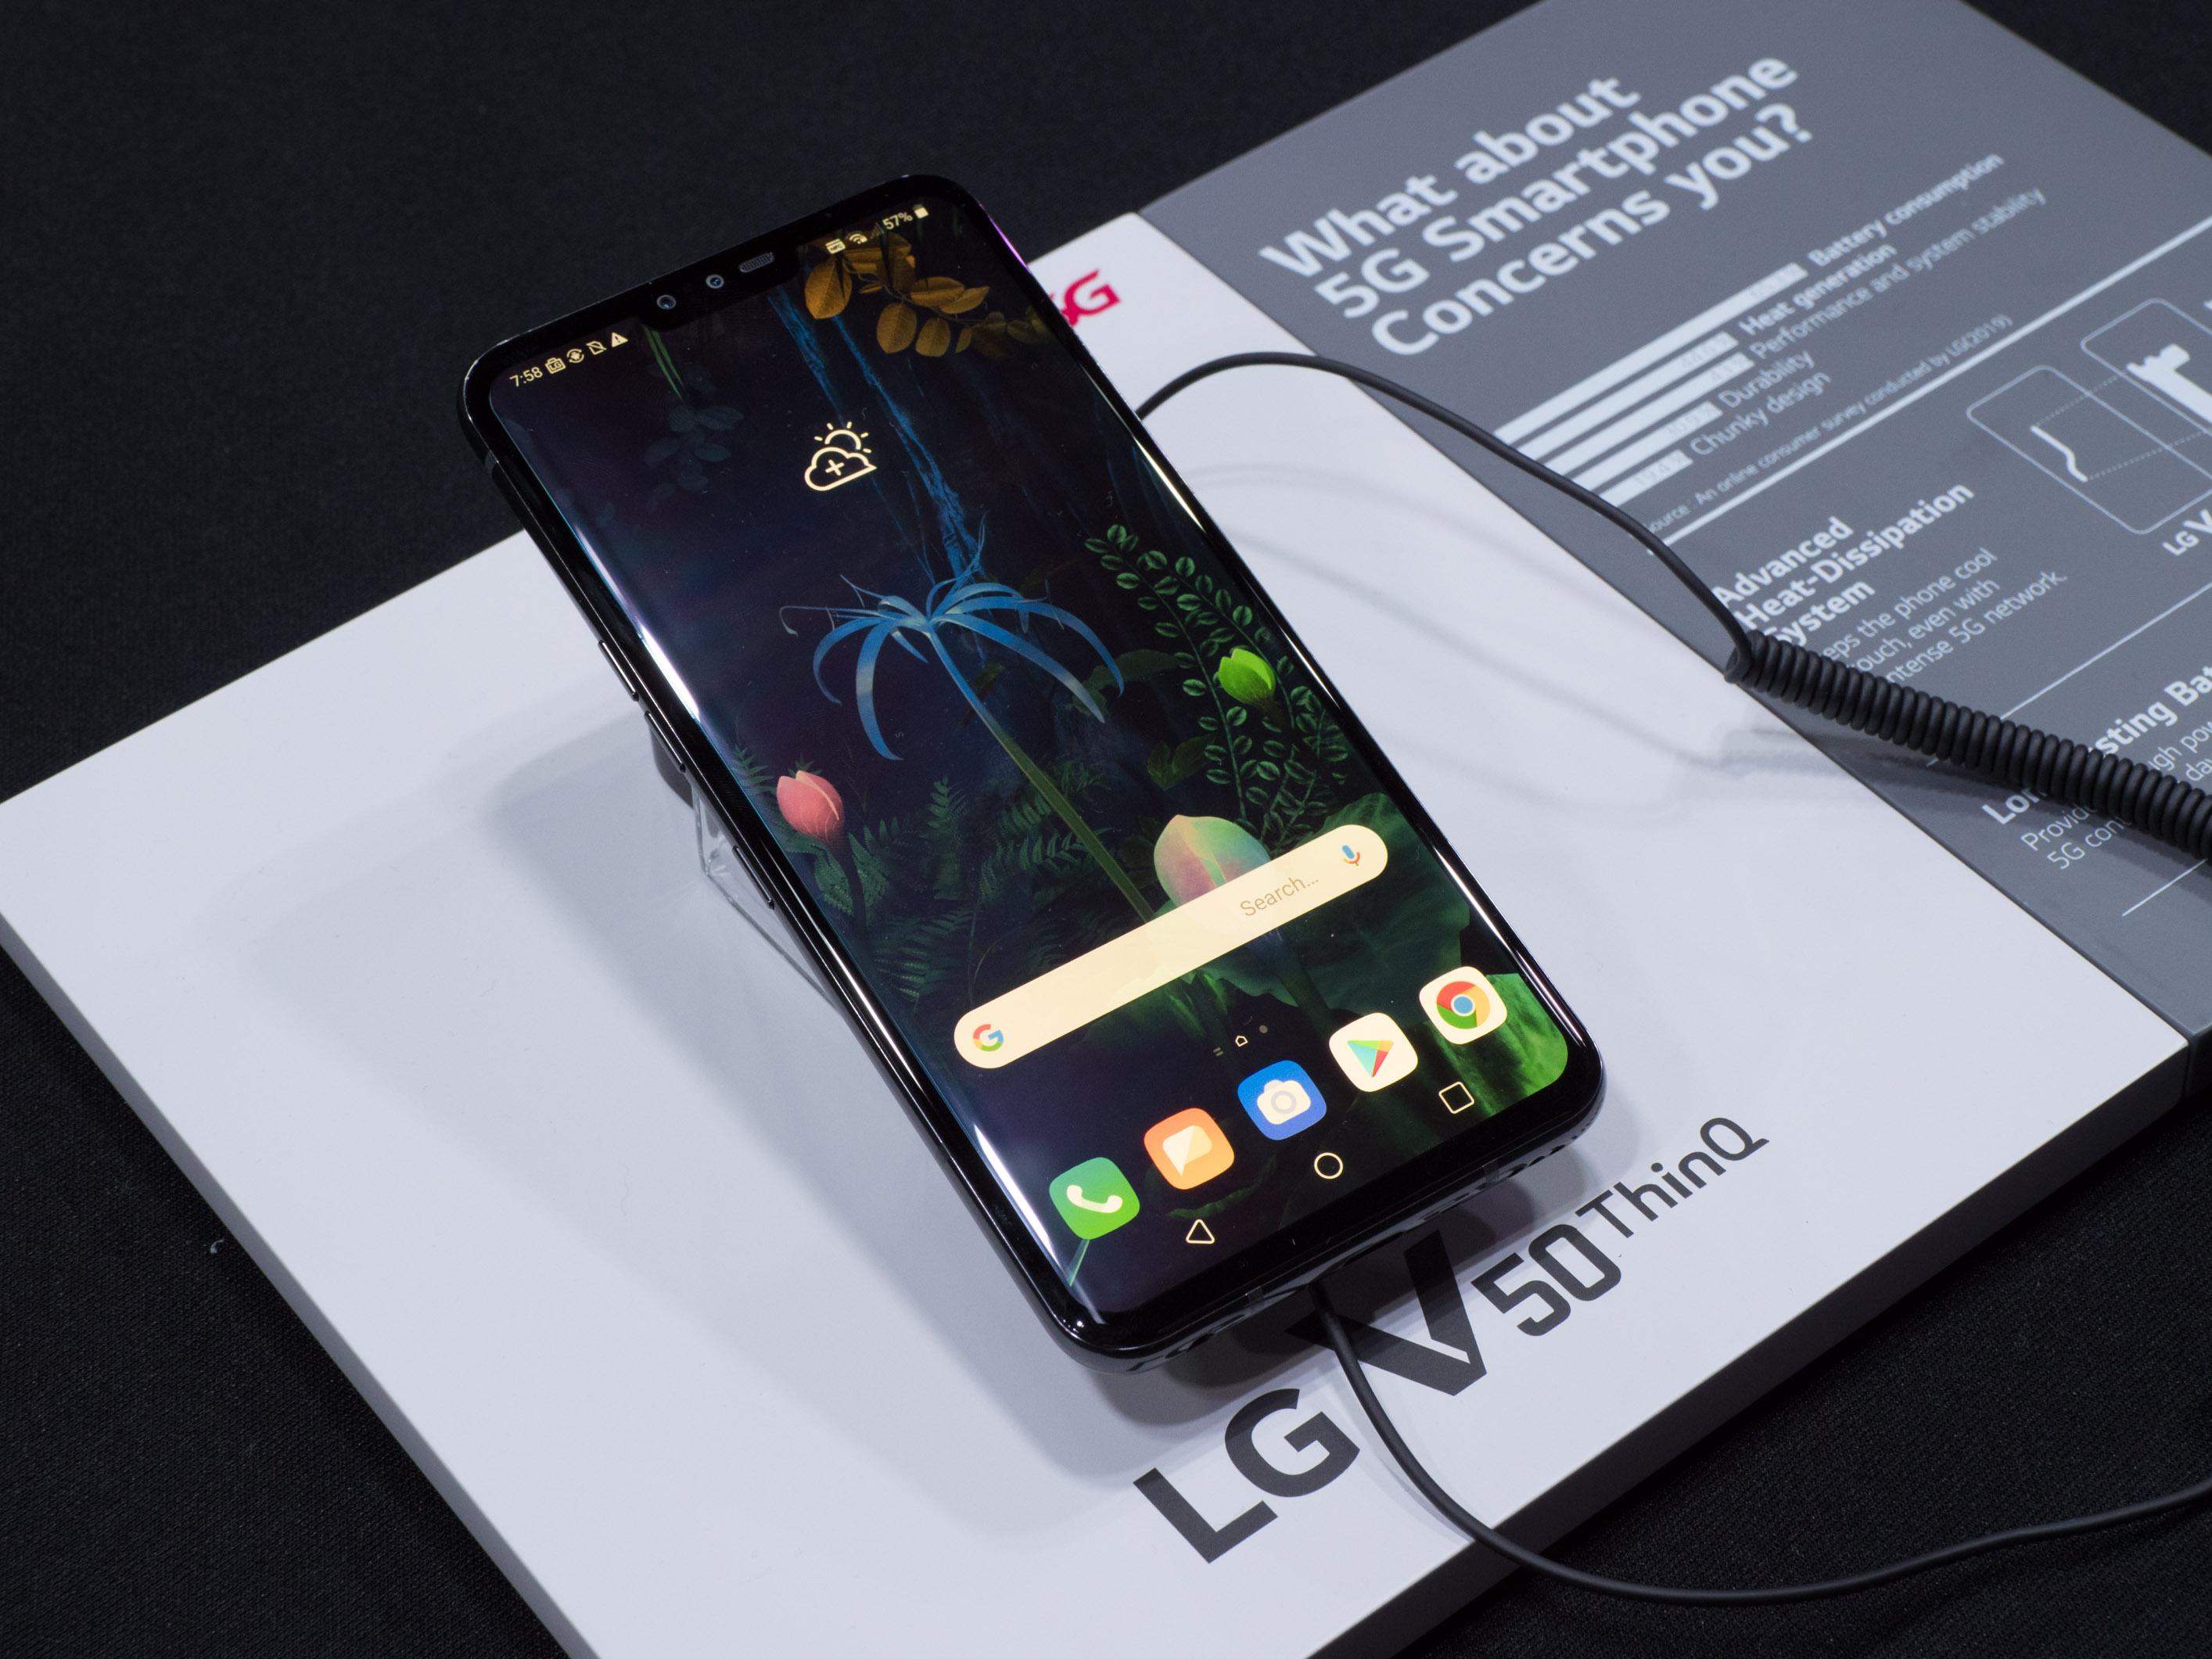 V50 Thinq Dual Screen im Hands on: LG zeigt Smartphone mit andockbarem Zusatzdisplay - LG V50 Thinq (Bild: Martin Wolf/Golem.de)